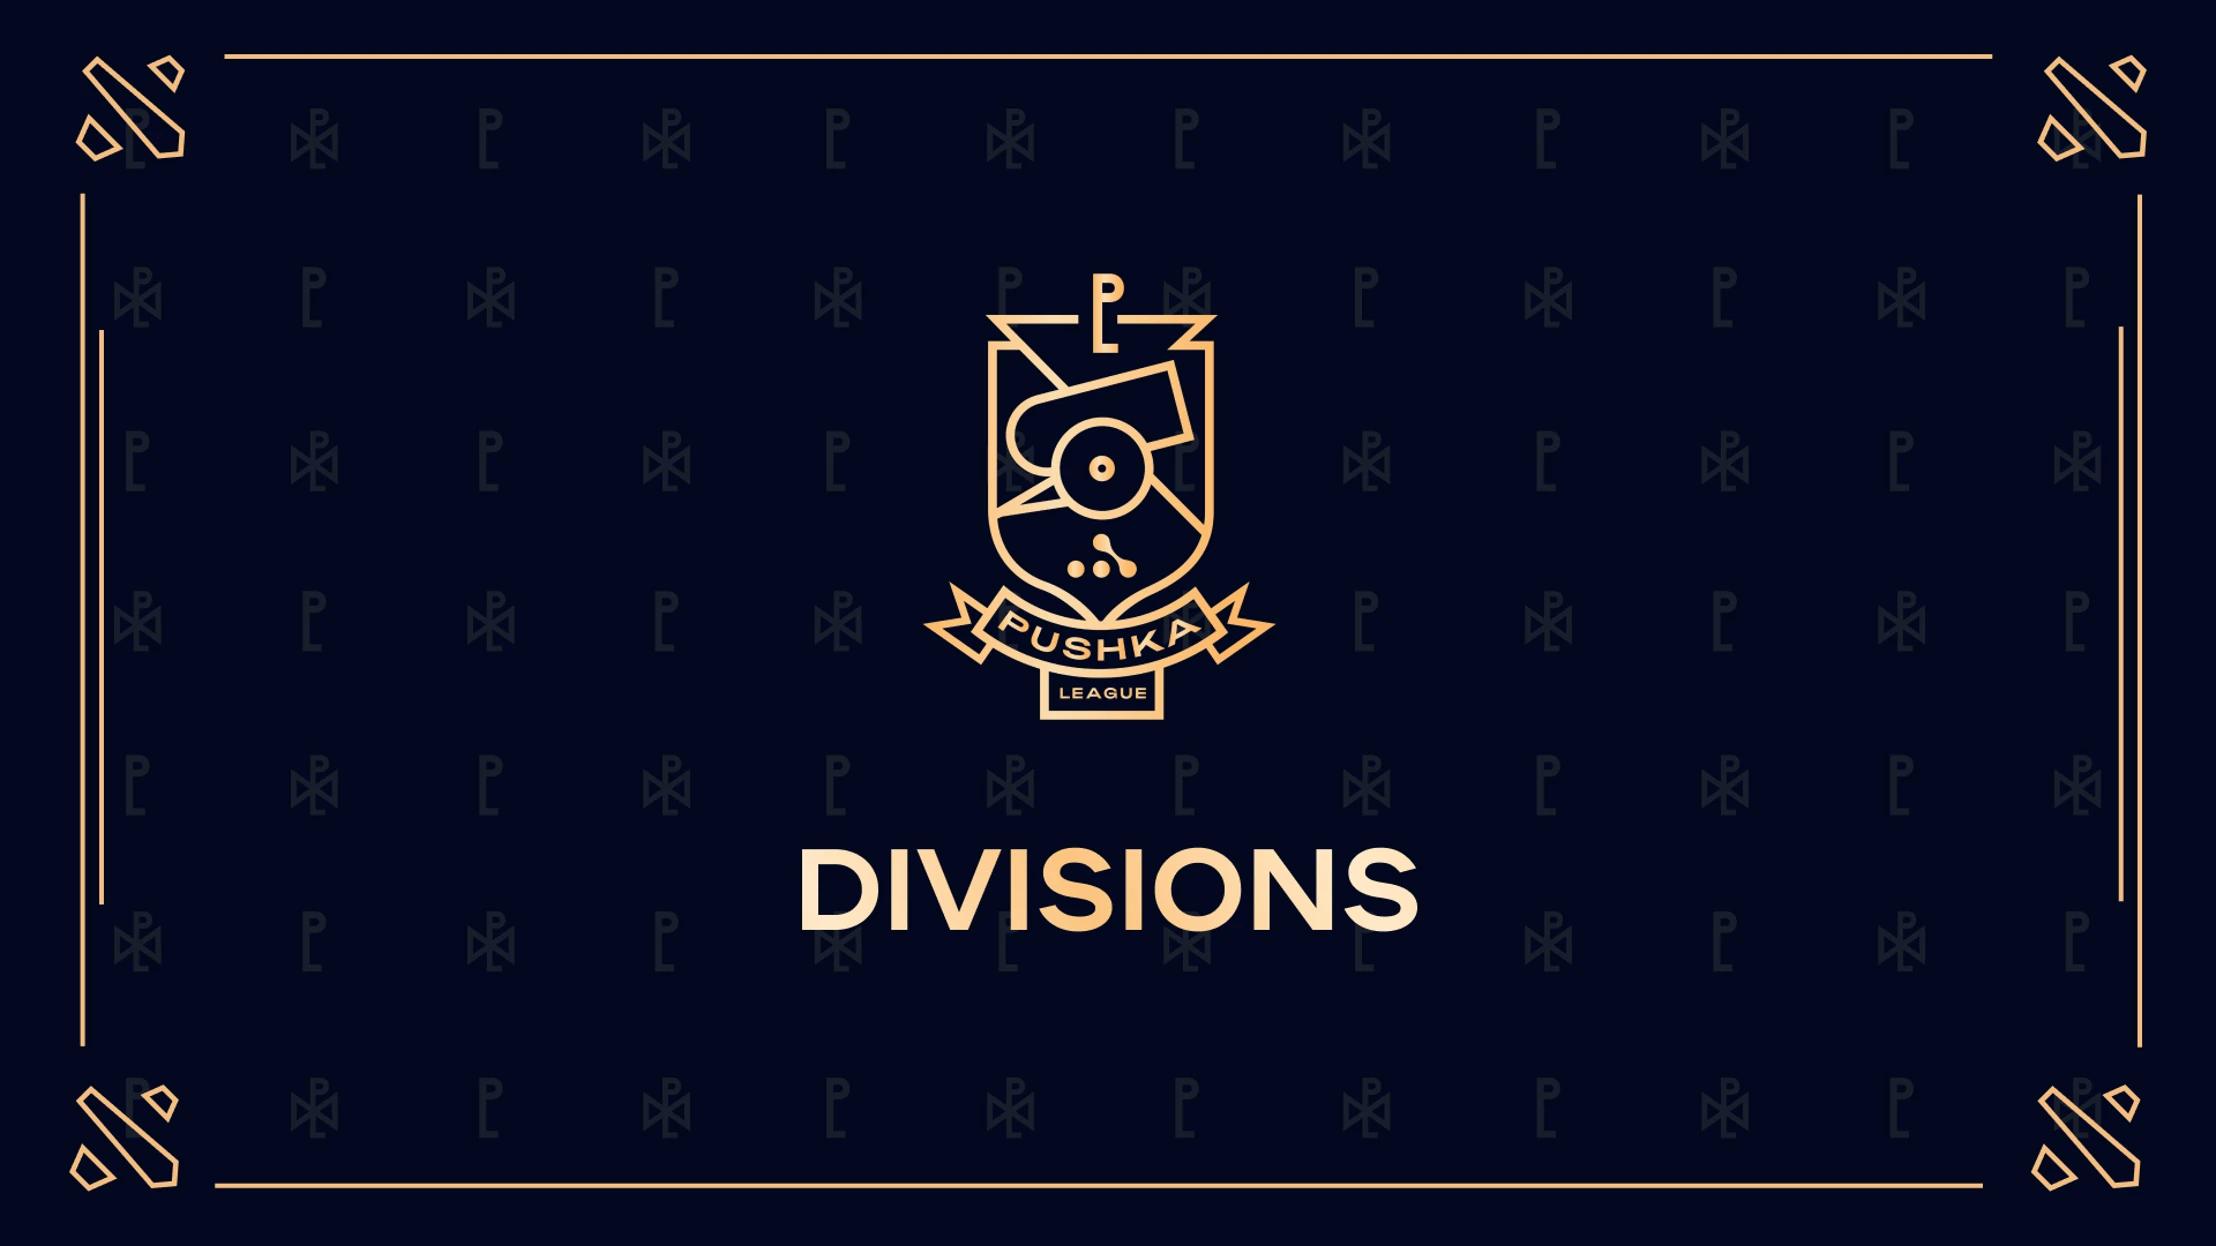 WePlay! Pushka League Division 2